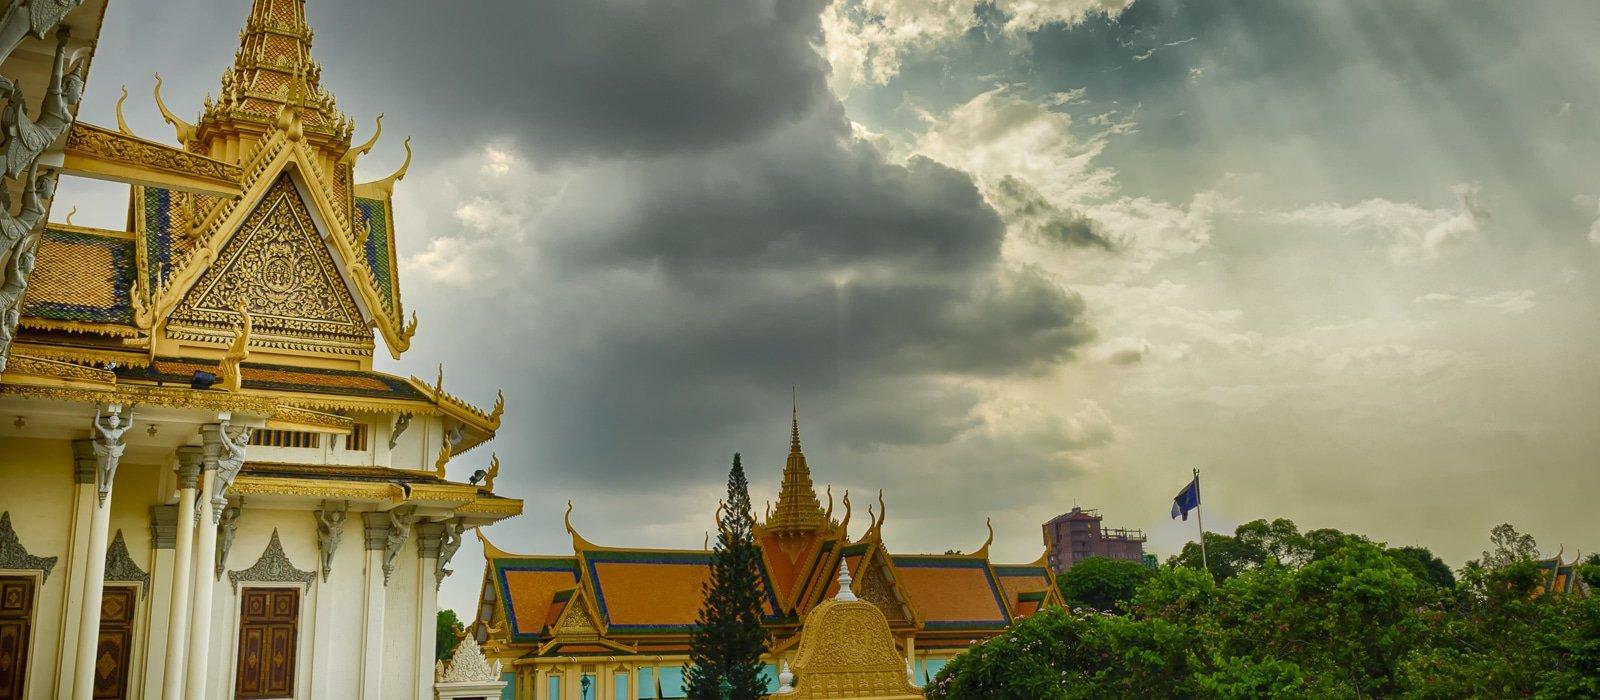 thumb - Cambodge-1600x700-14.jpg